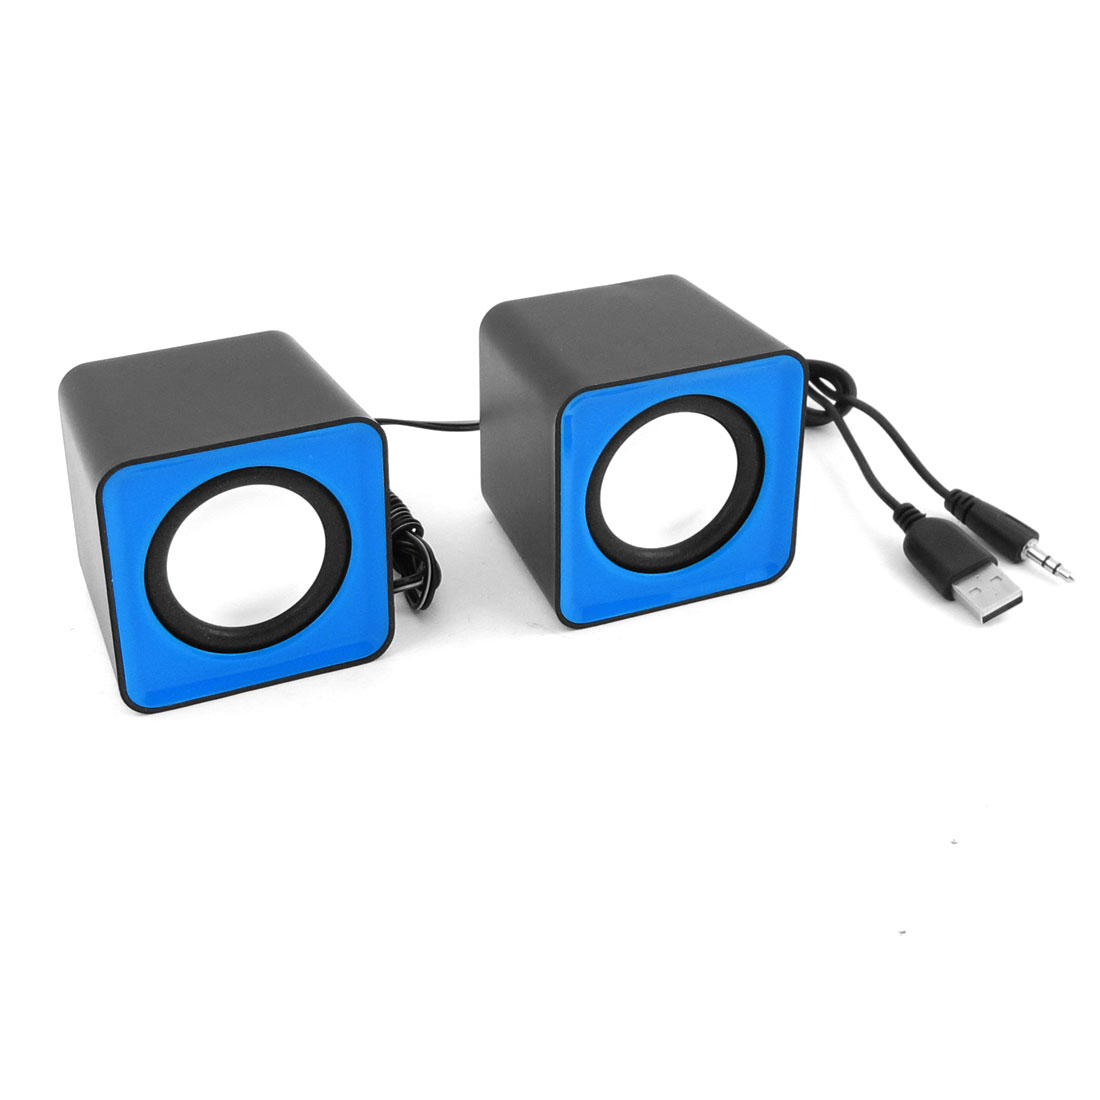 Pair Black Blue USB 2.0 3.5mm Stereo Mini Multimedia Speaker Sound Box